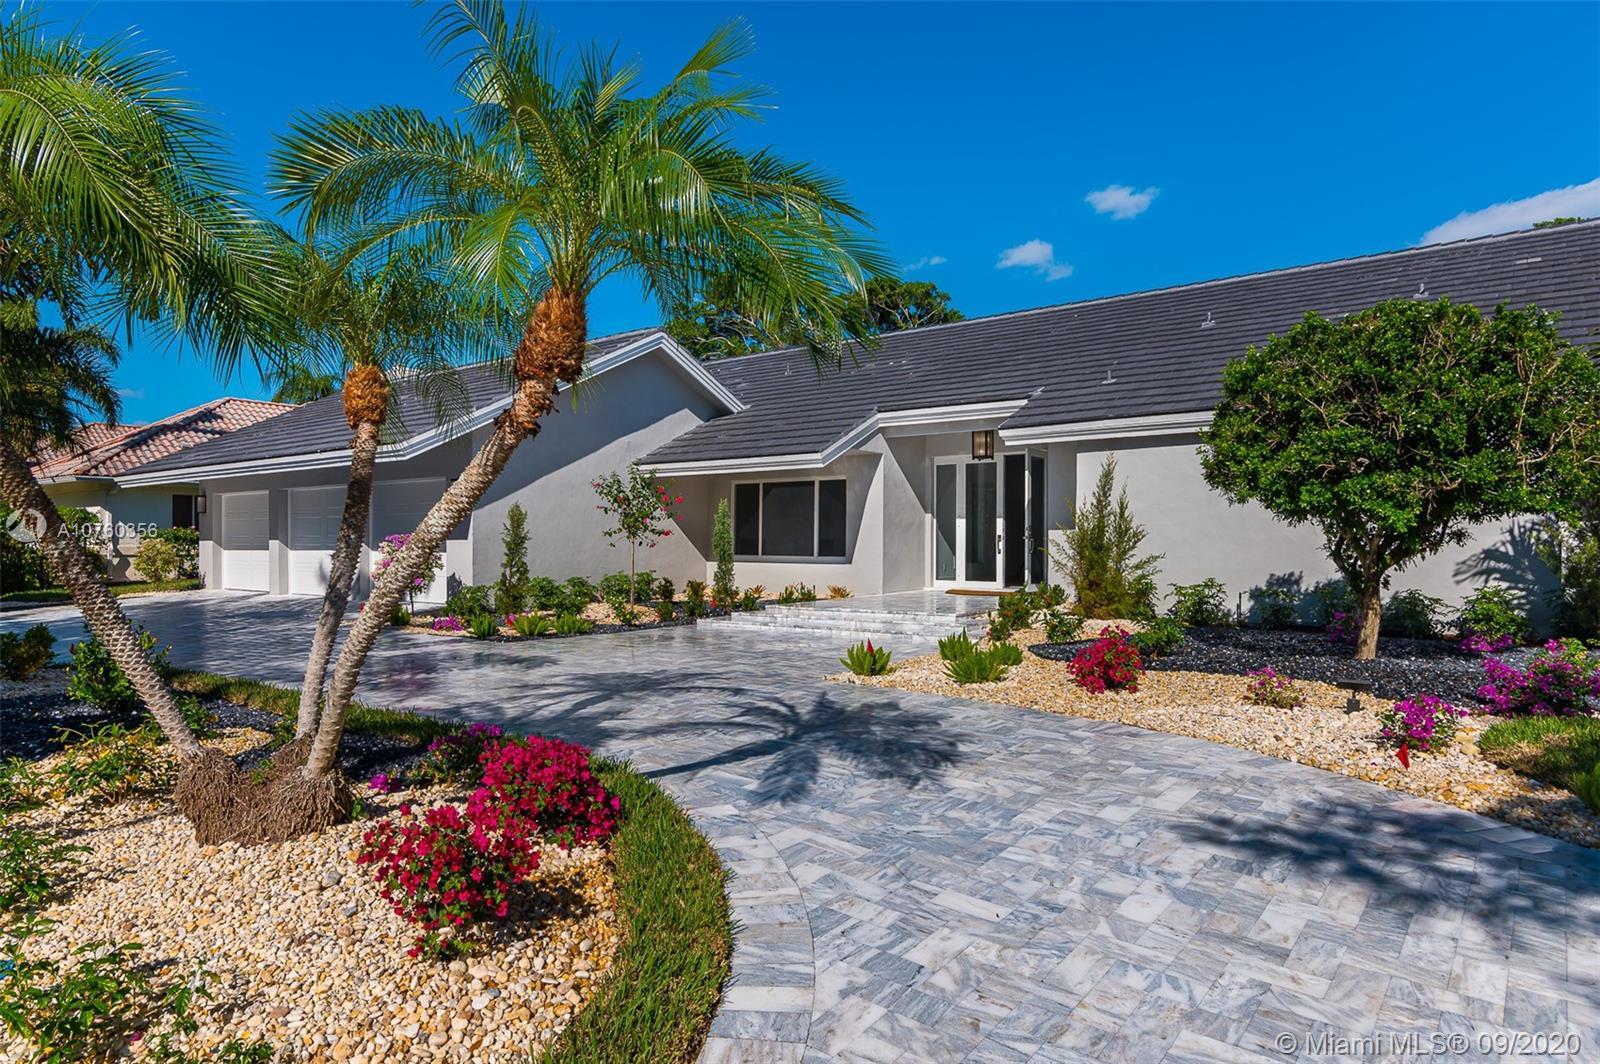 575 Sandpiper Way, Boca Raton, FL 33431